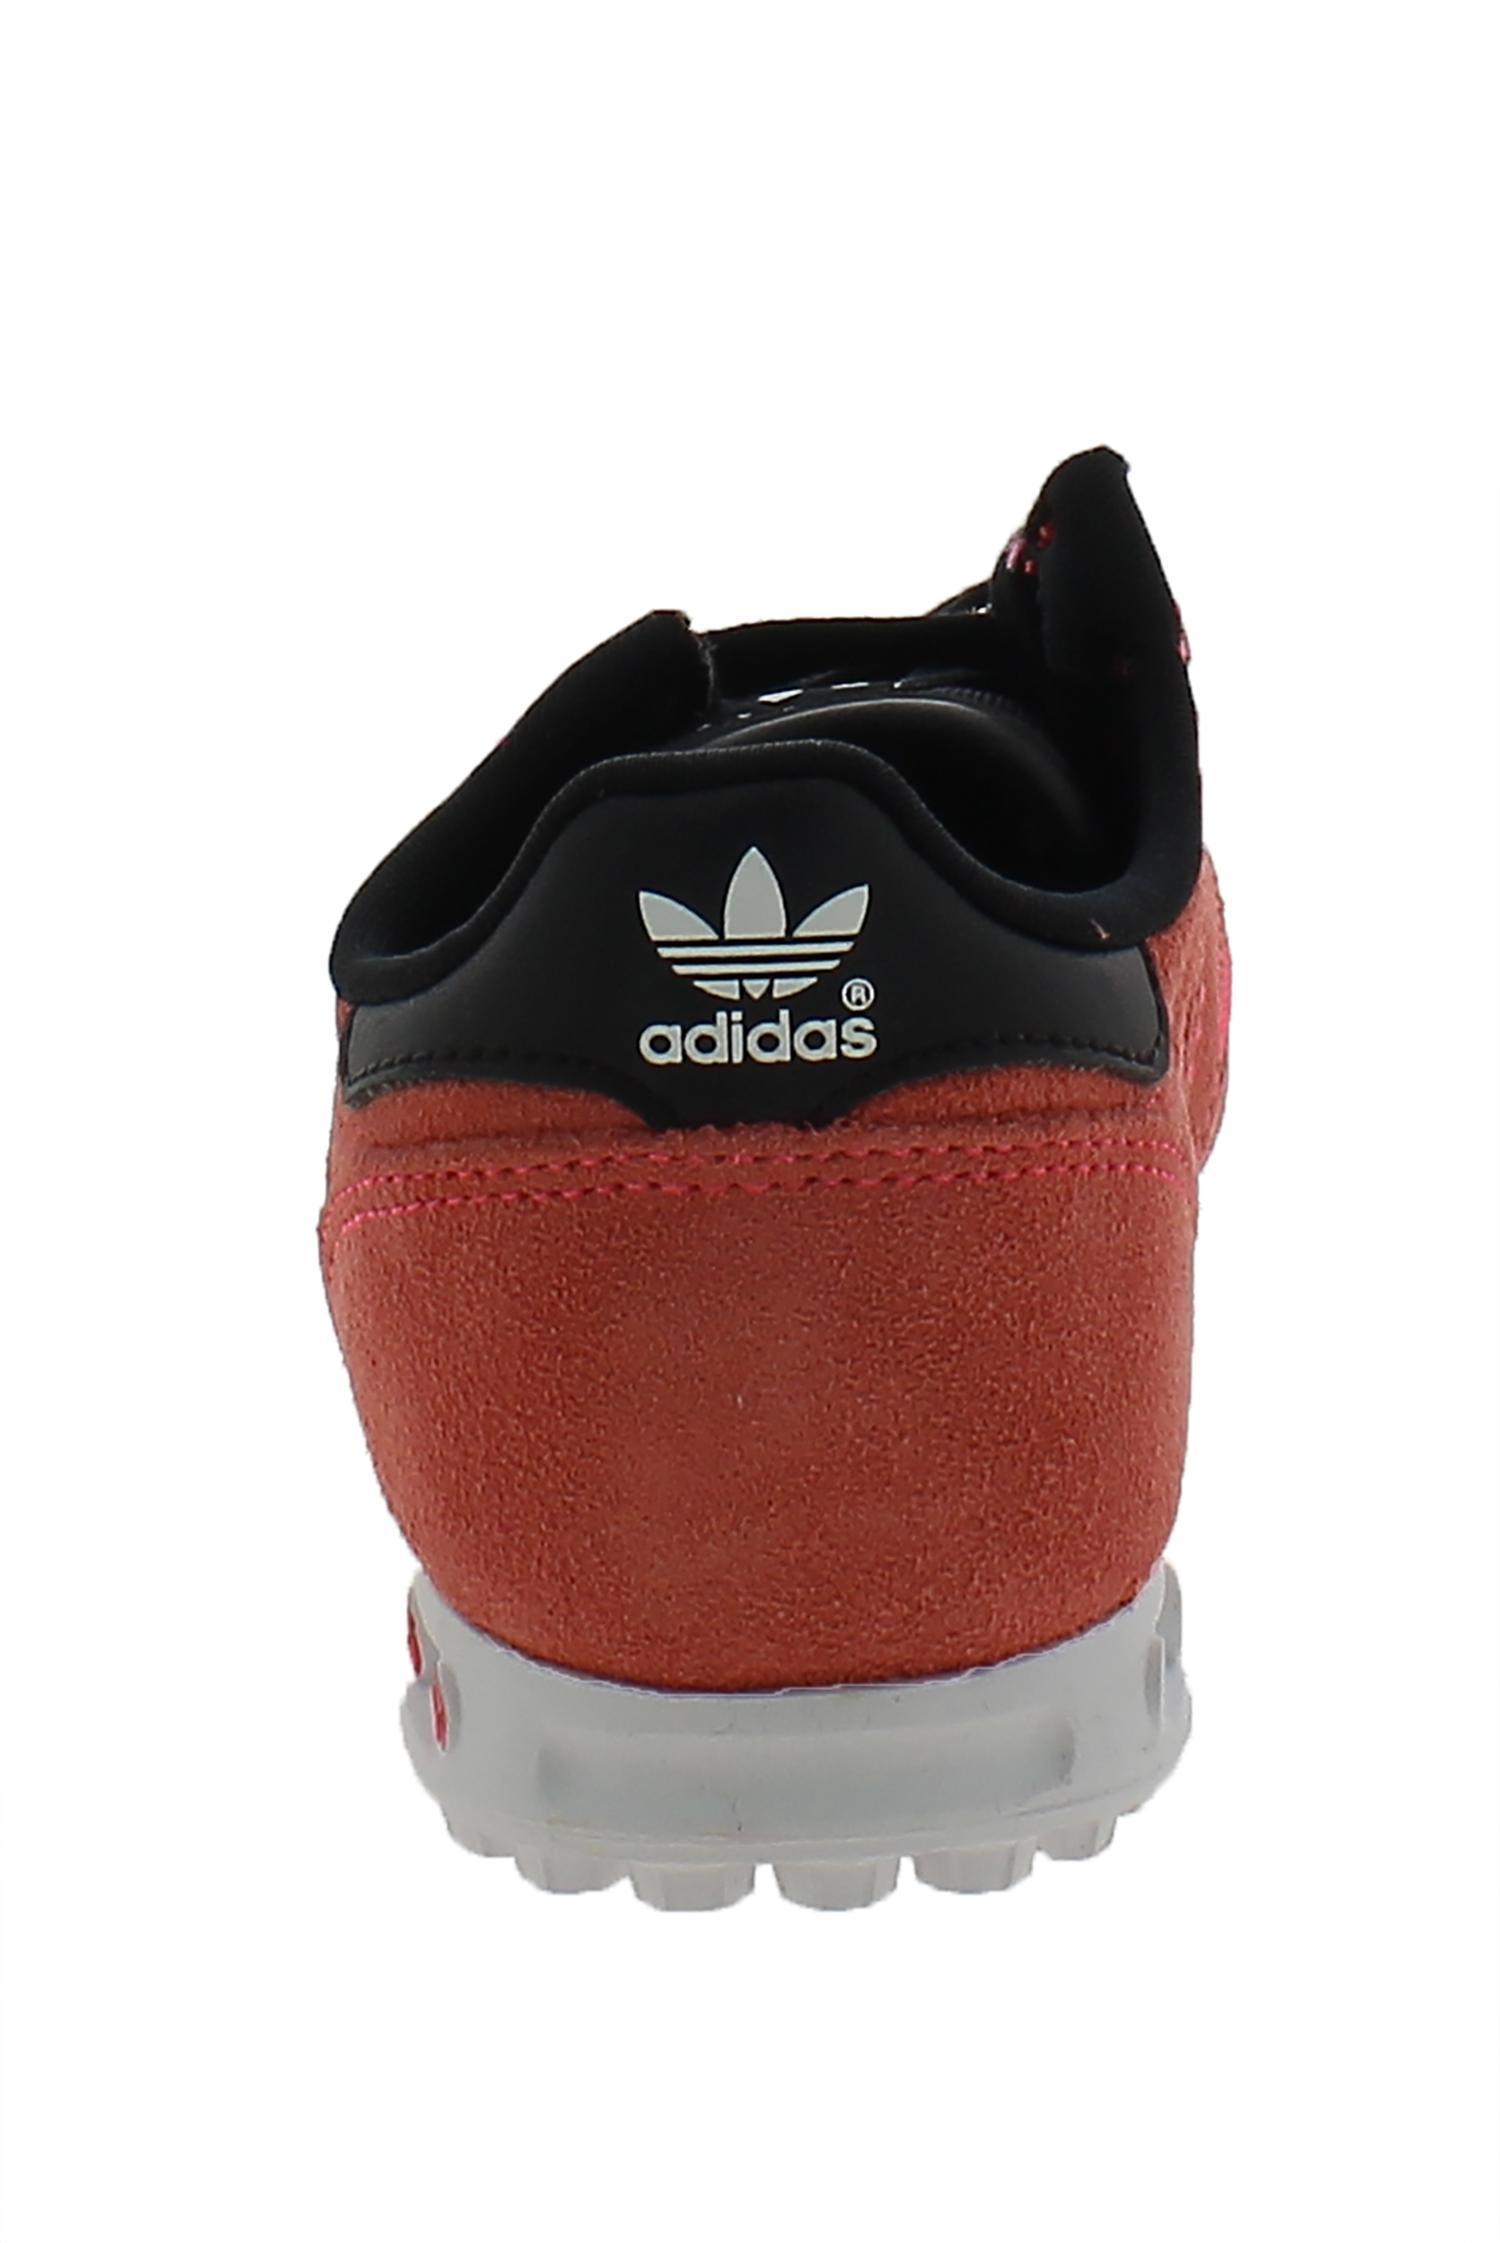 adidas adidas la trainer scarpe sportive rosse pelle tela s82616